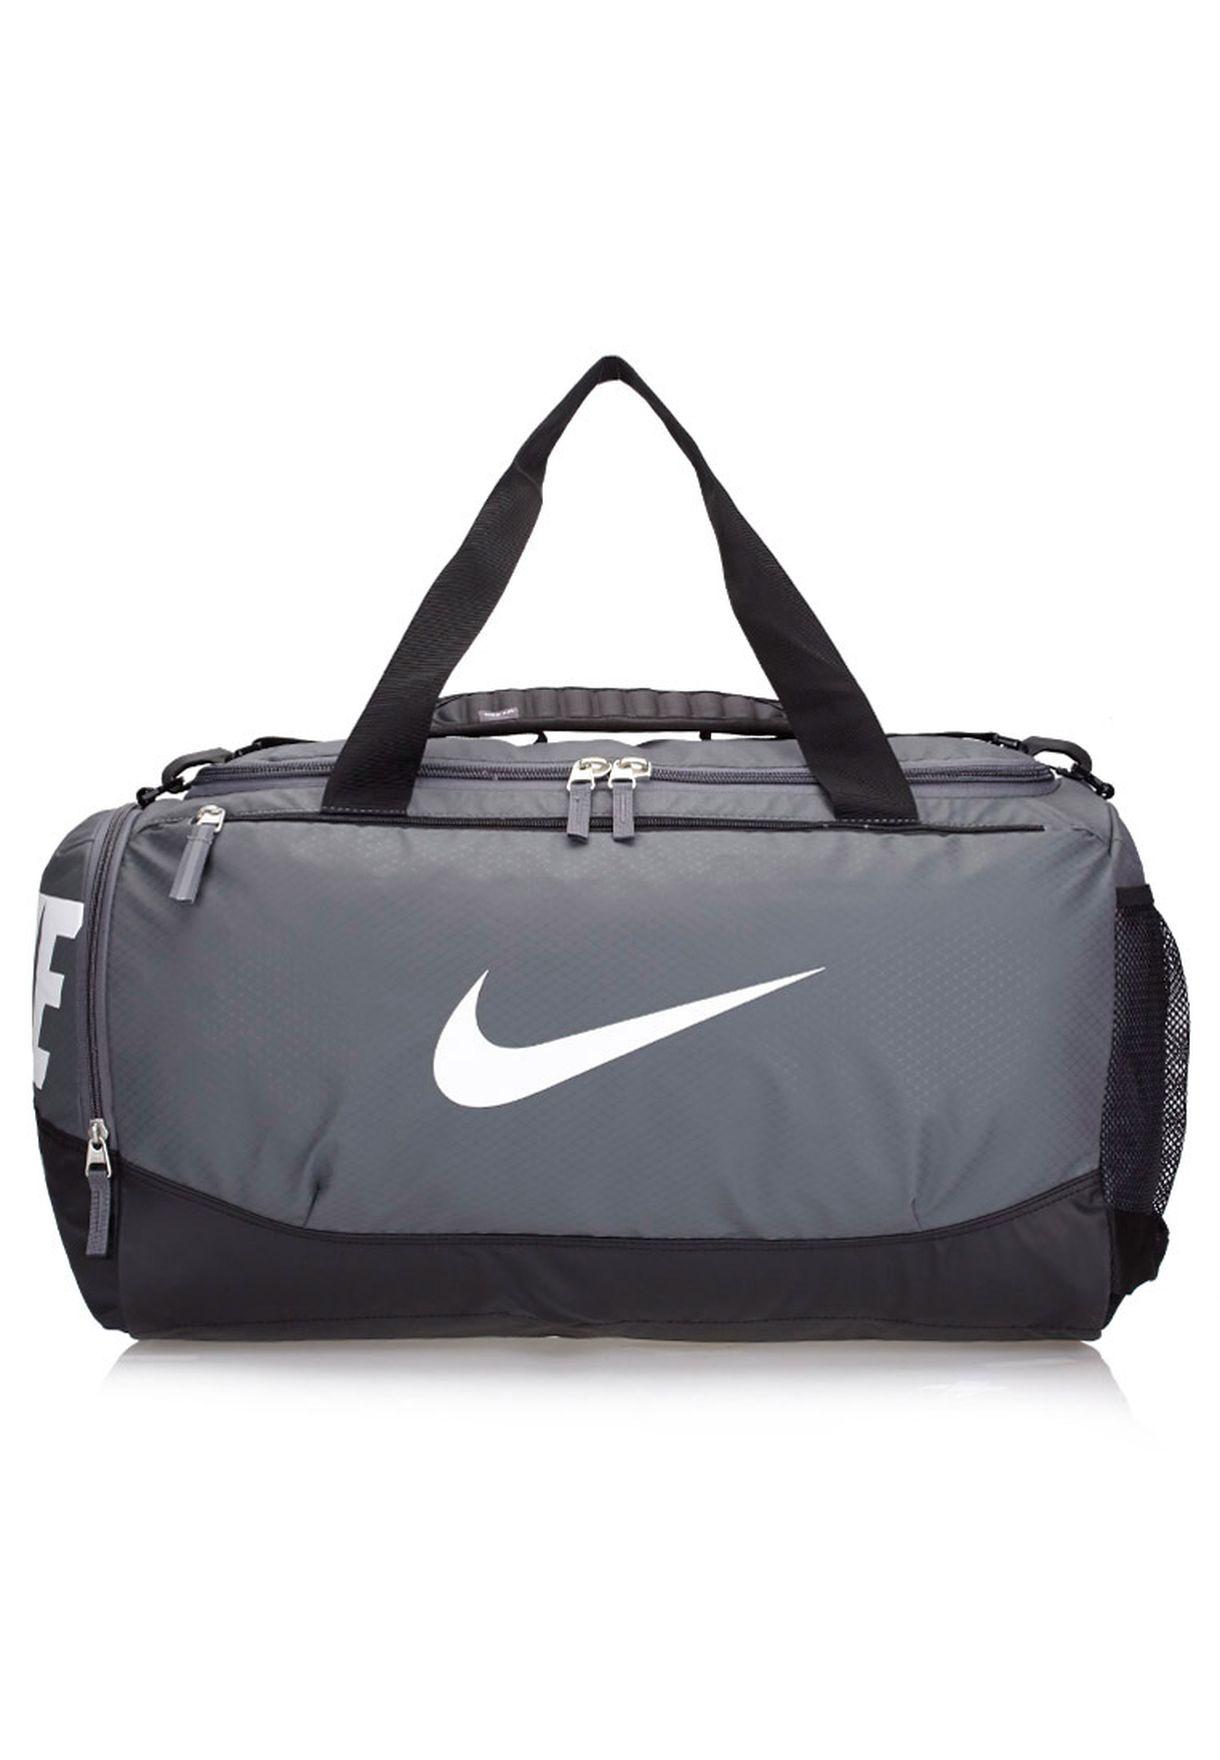 4c82ec12d6 Shop Nike black Medium Team Training Max Air Duffel Bag BA4895-074 ...